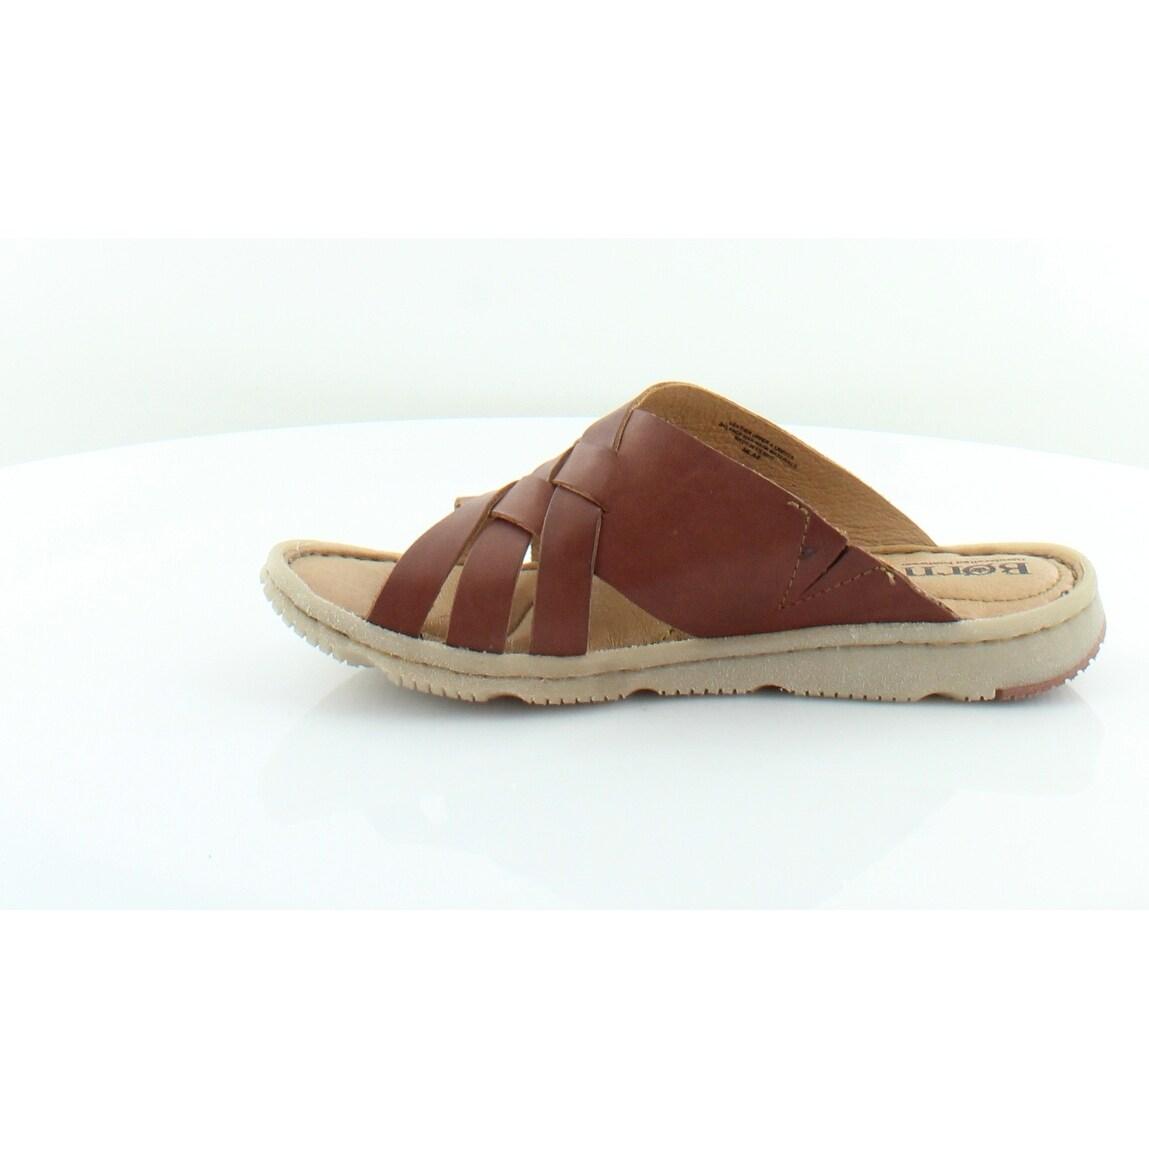 051391bcea1e Shop Born Tarpon Women s Sandals BROWN - 6 - Free Shipping Today -  Overstock.com - 27220104